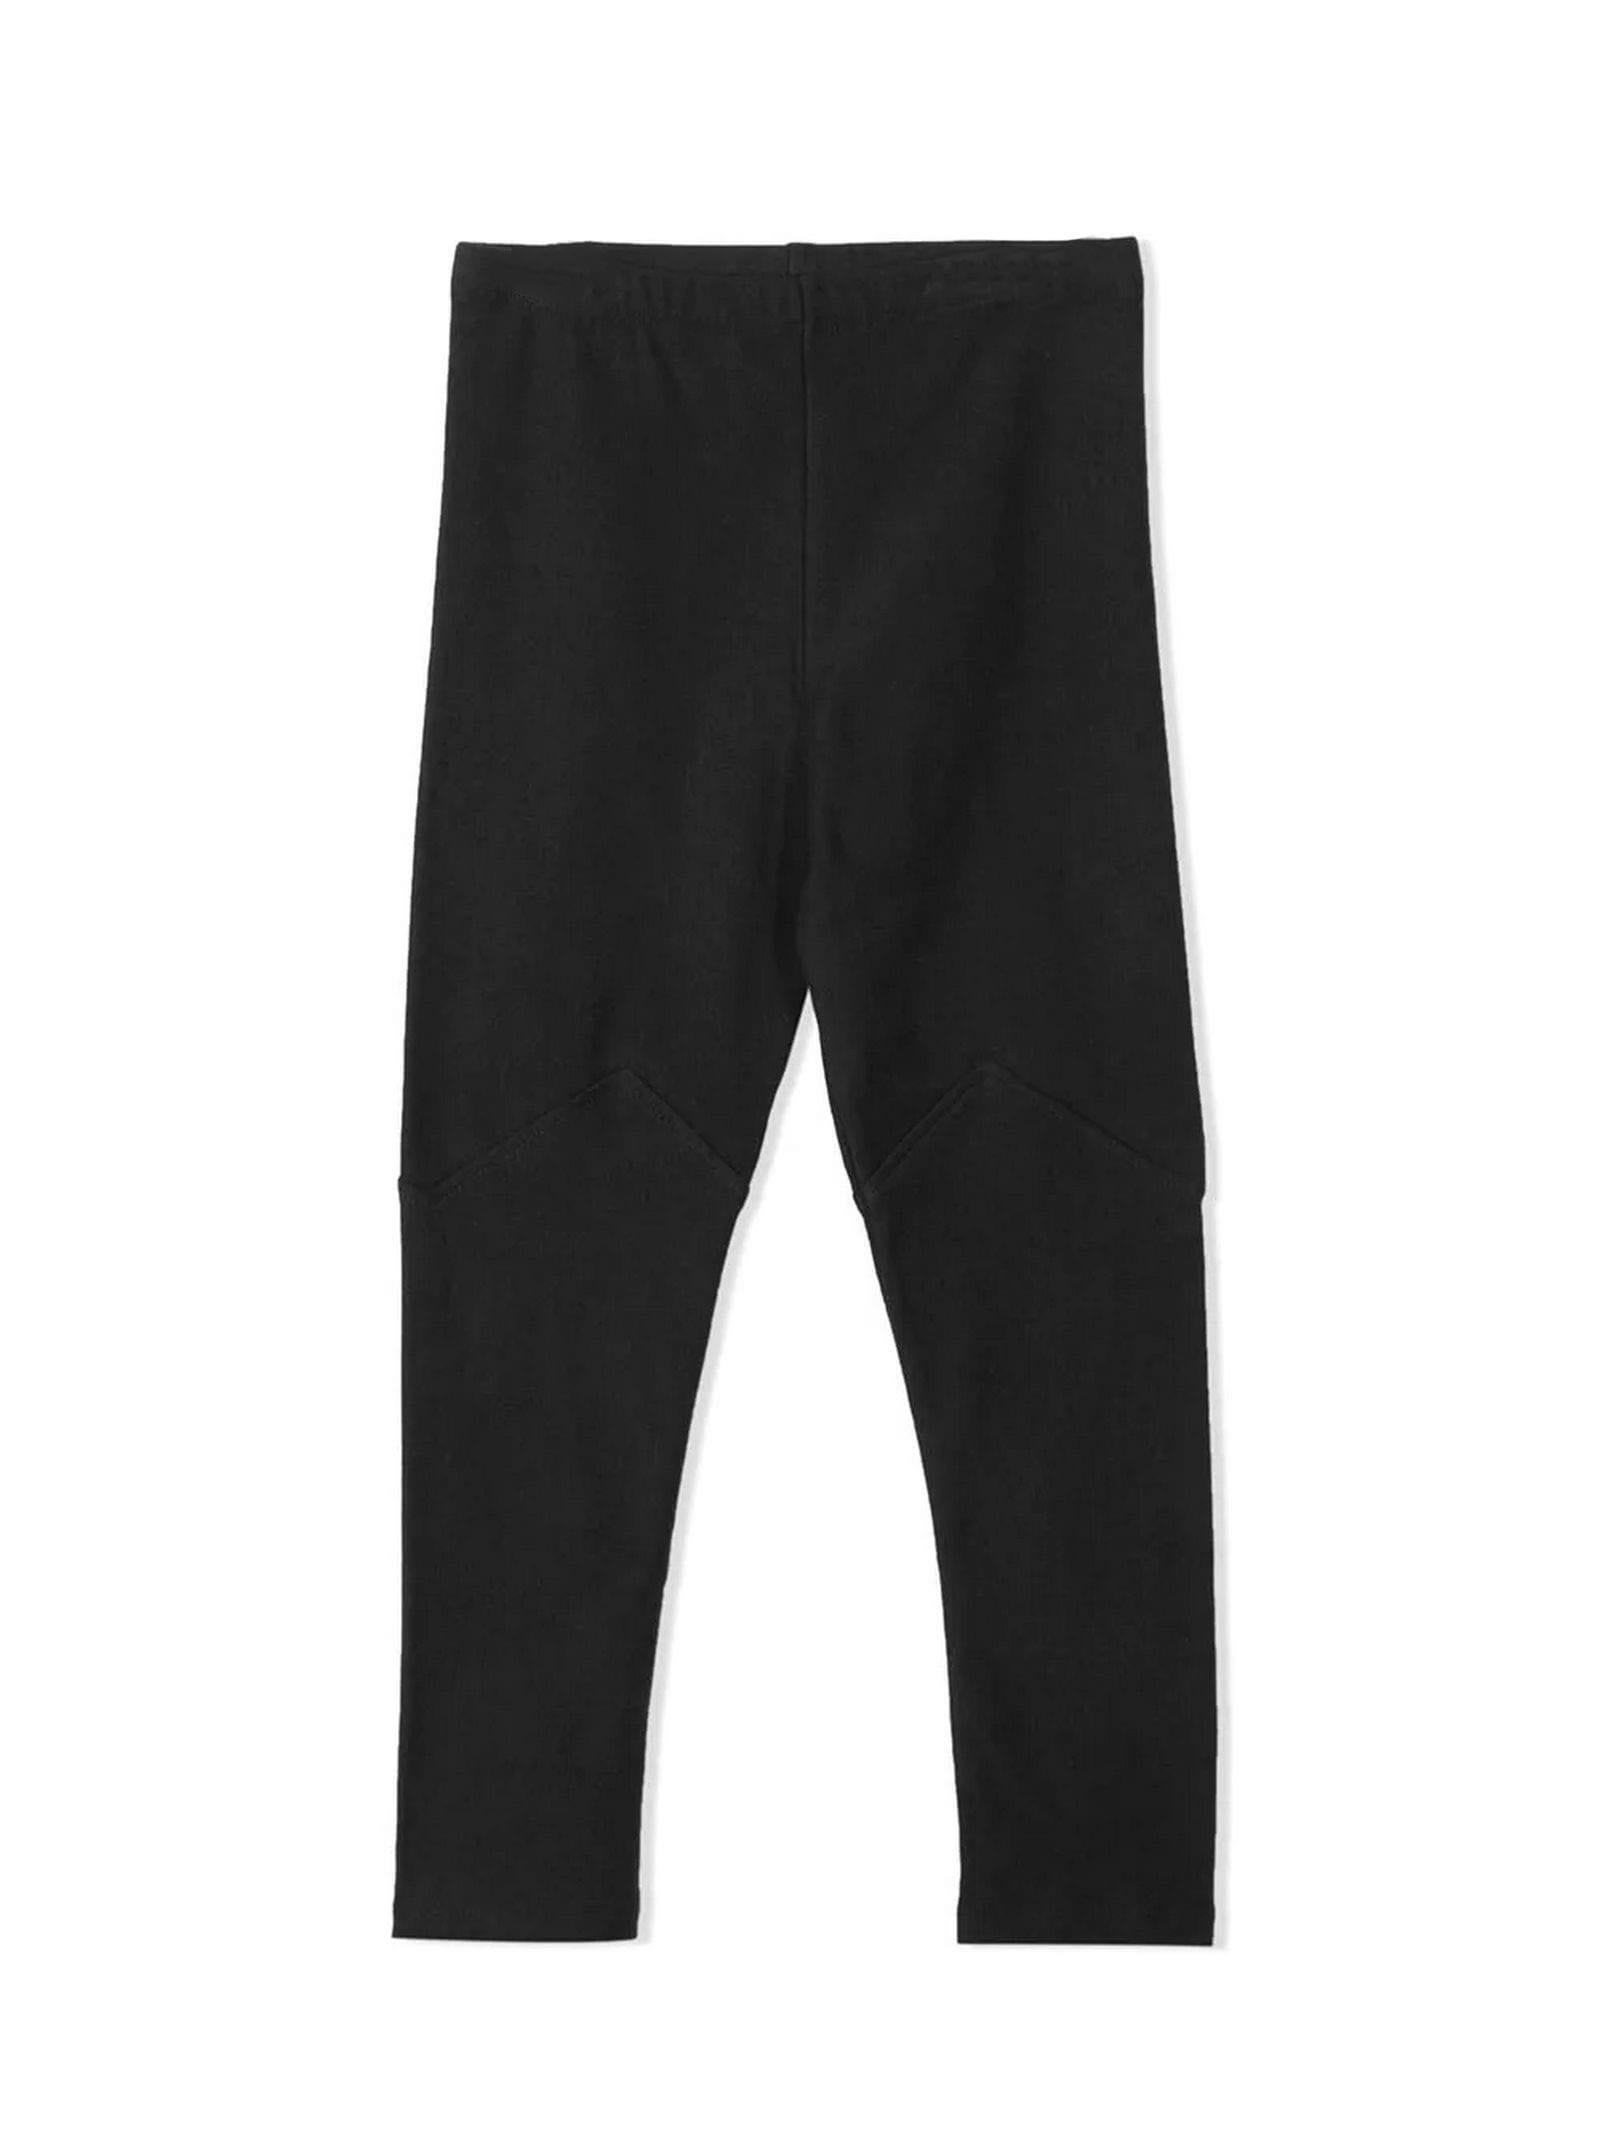 Grey Cotton Blend Trousers